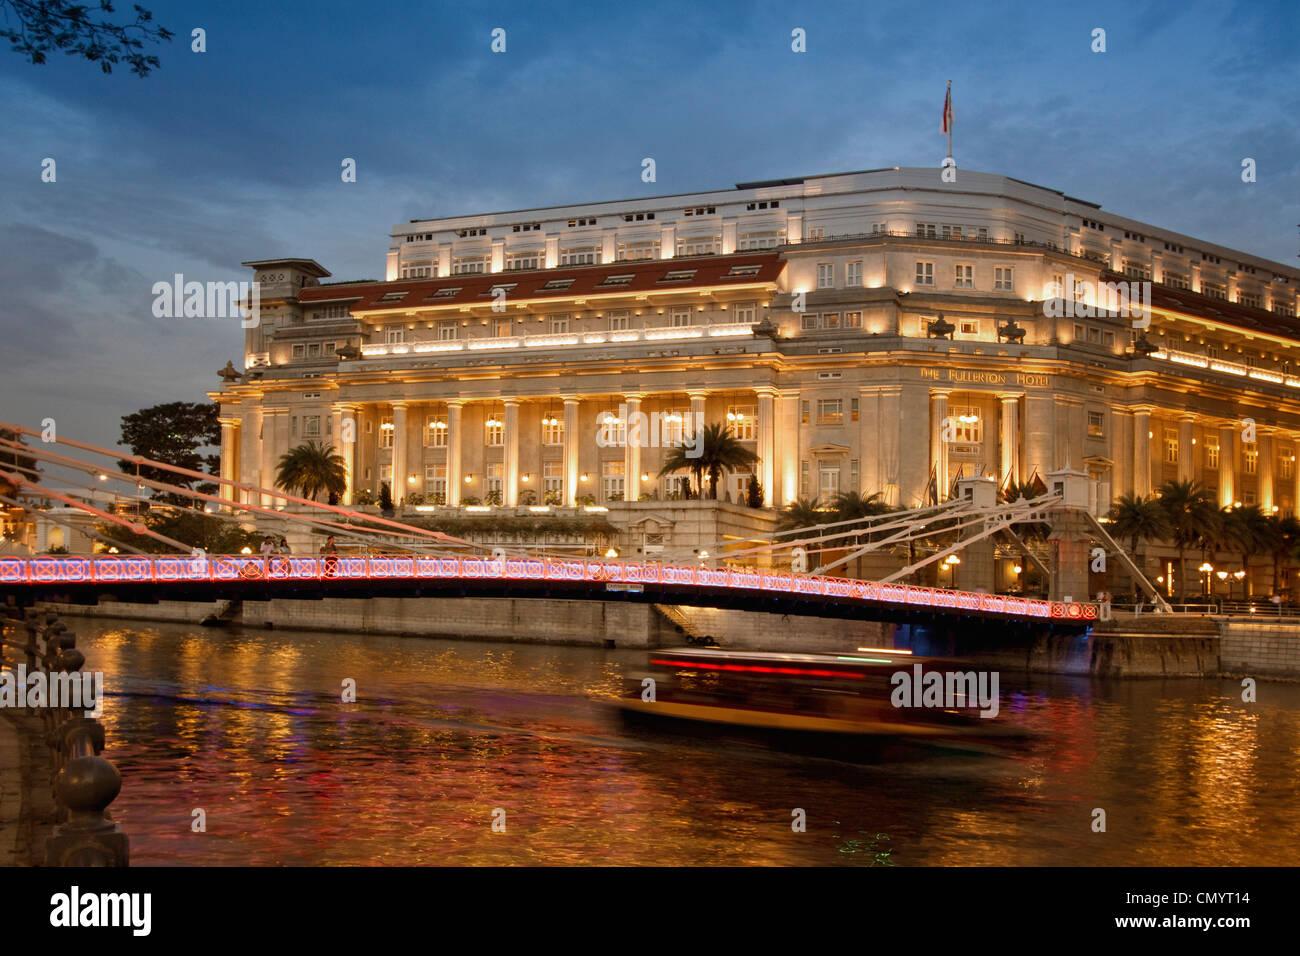 The Fullerton Hotel, Singapur Aisia - Stock Image